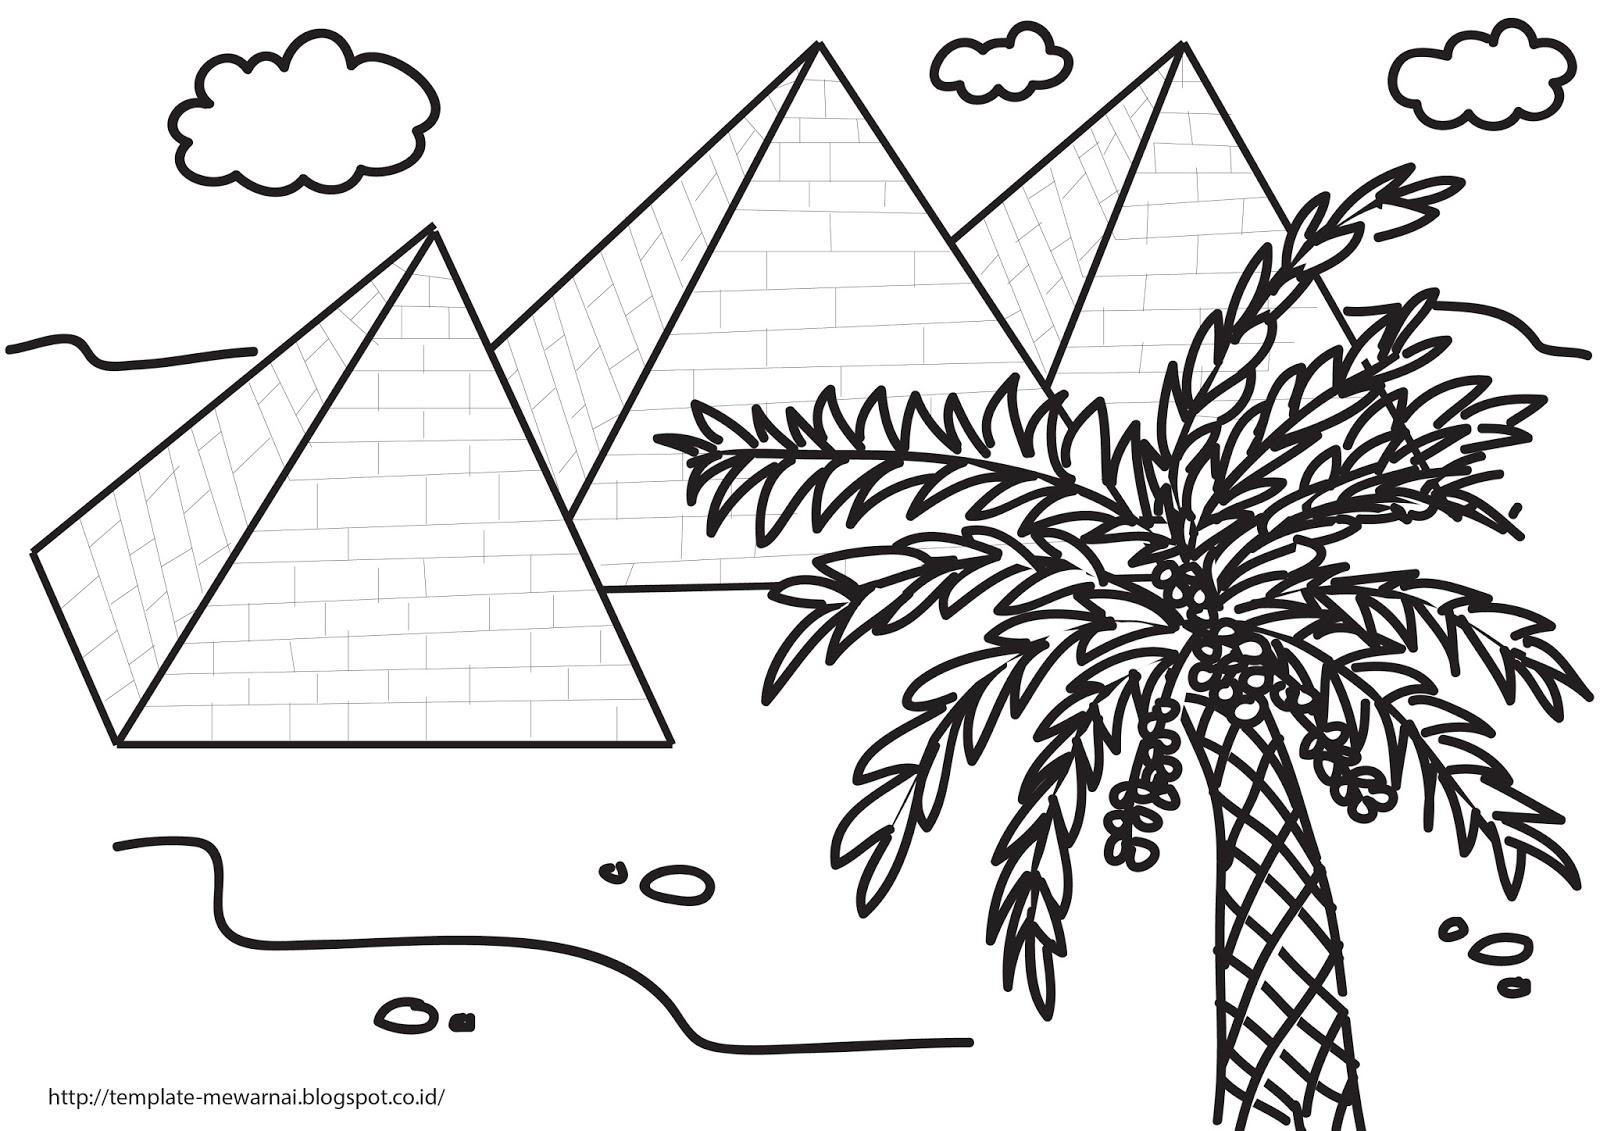 Kumpulan Gambar Sketsa Pohon Kurma Sketsa Gambar